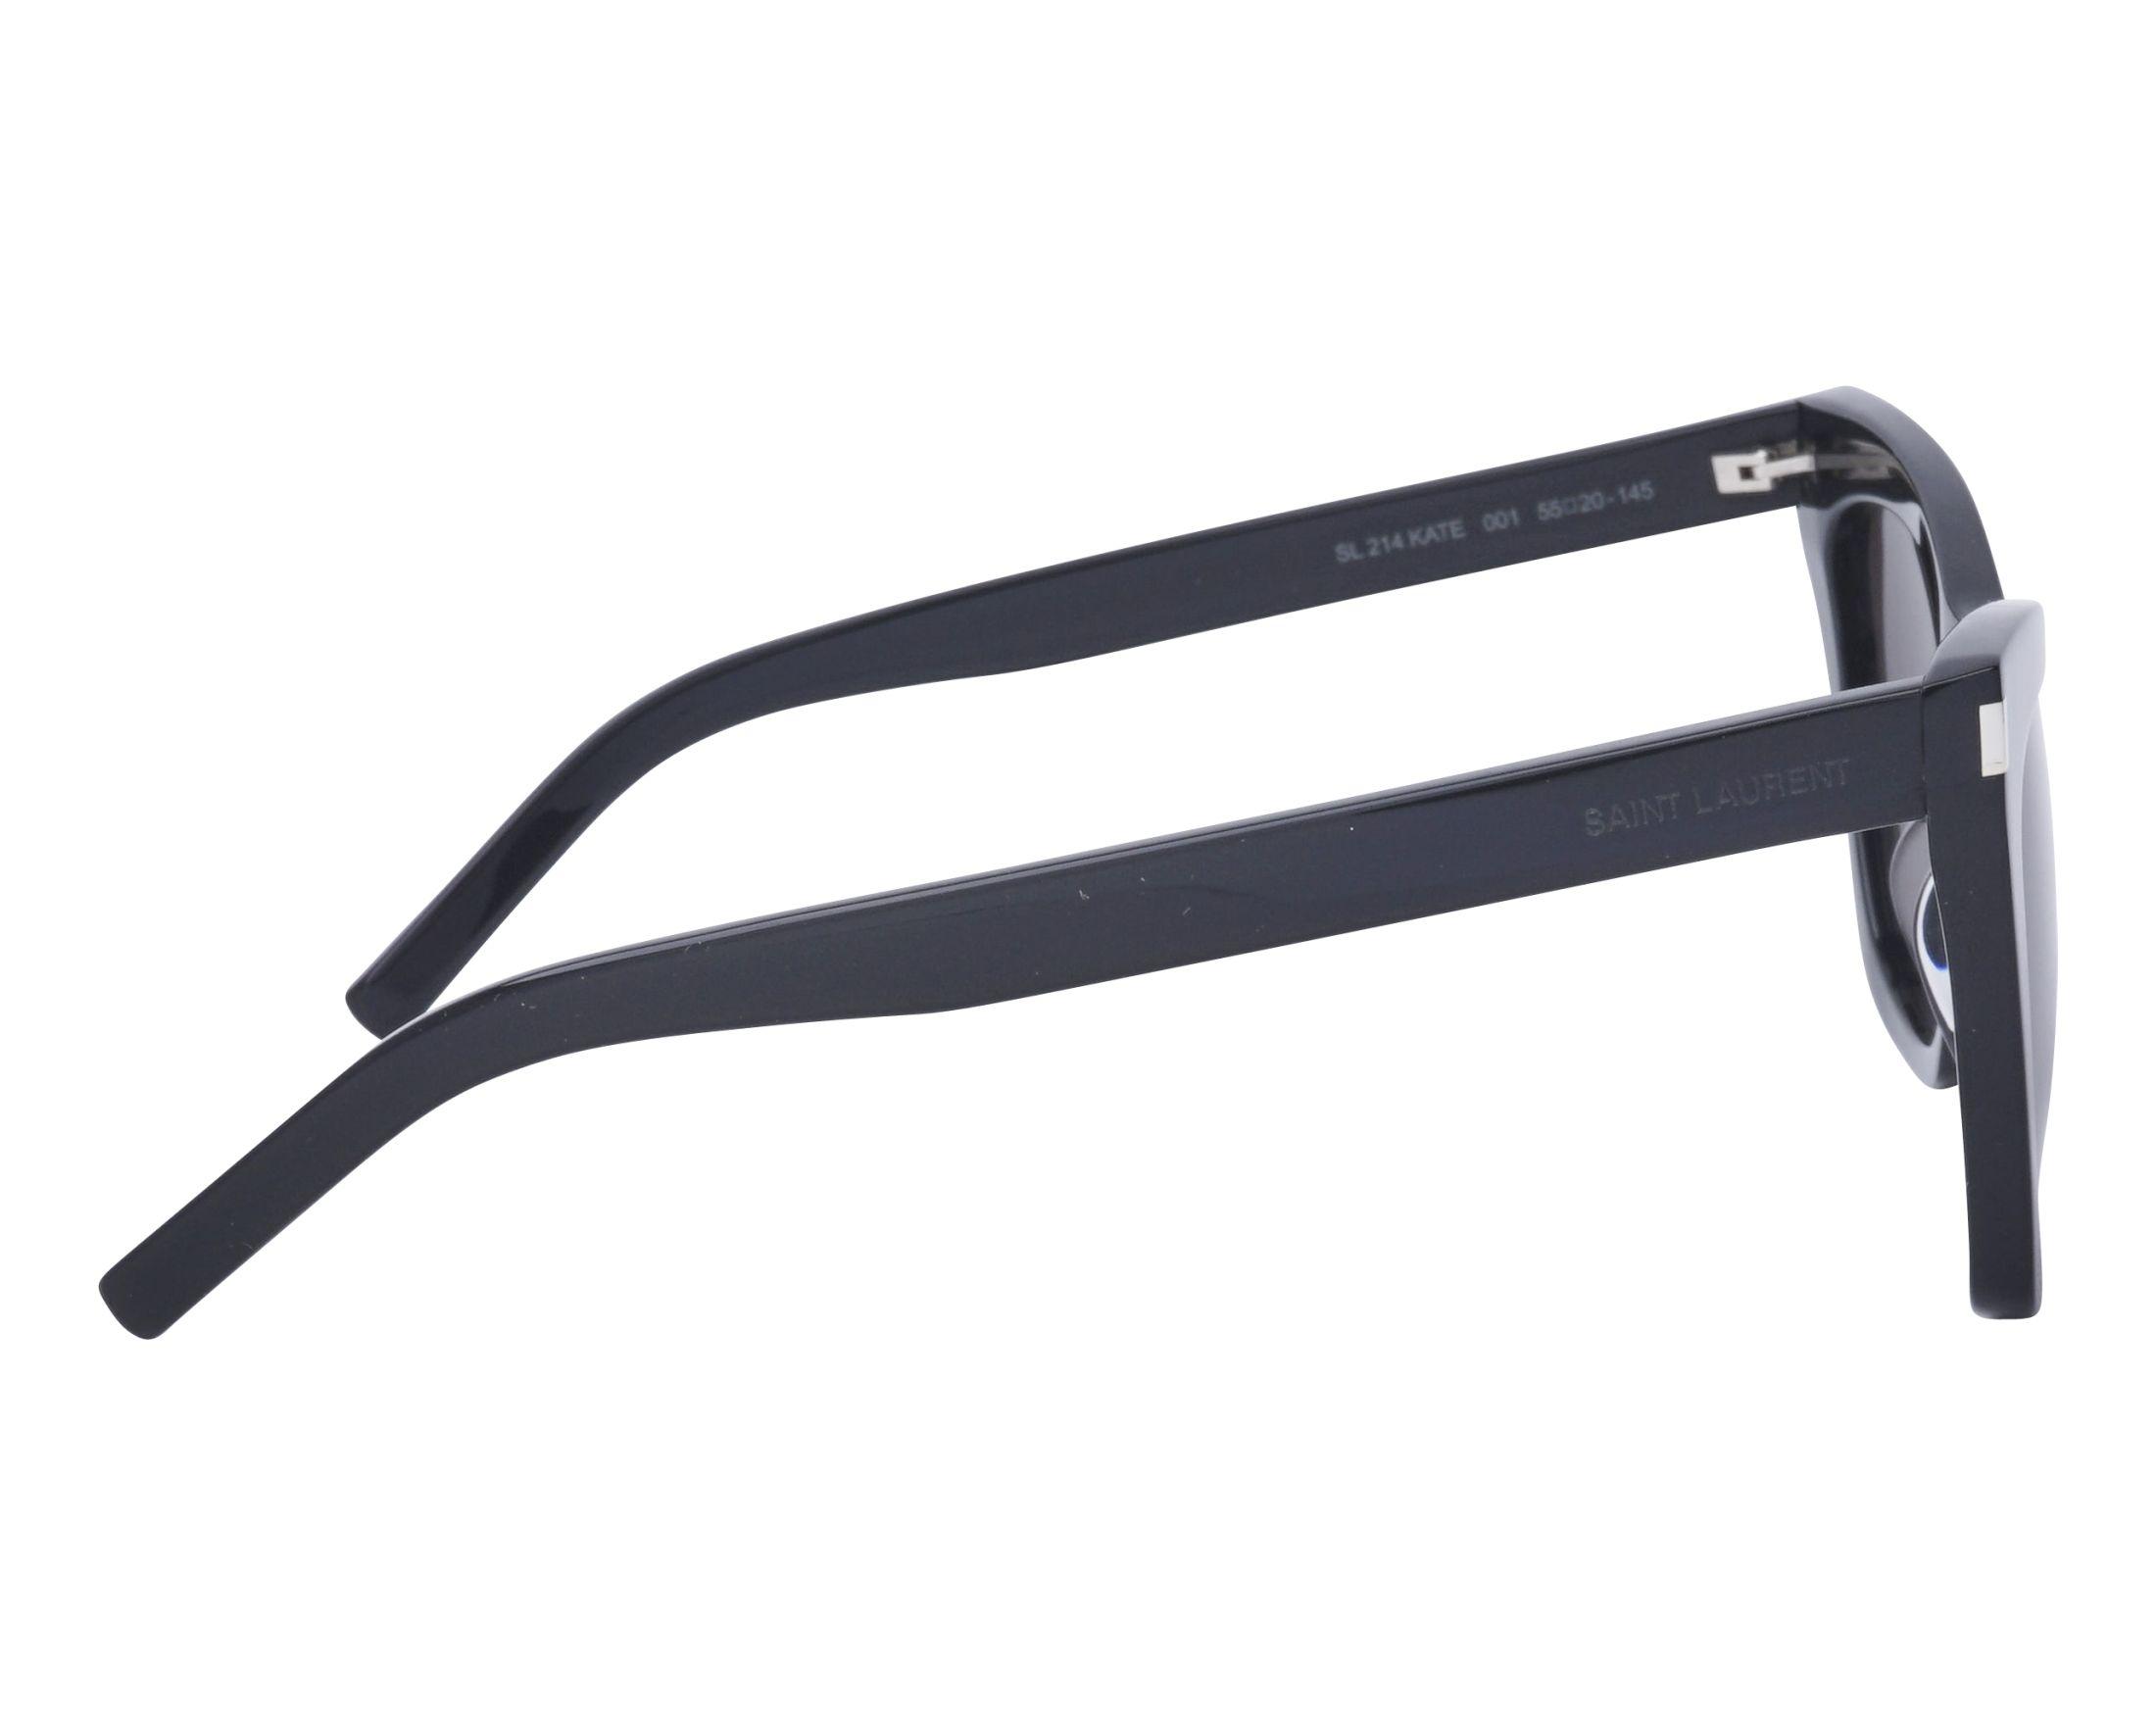 9fc0e296f1a Sunglasses Yves Saint Laurent SL-214 001 55-20 Black side view